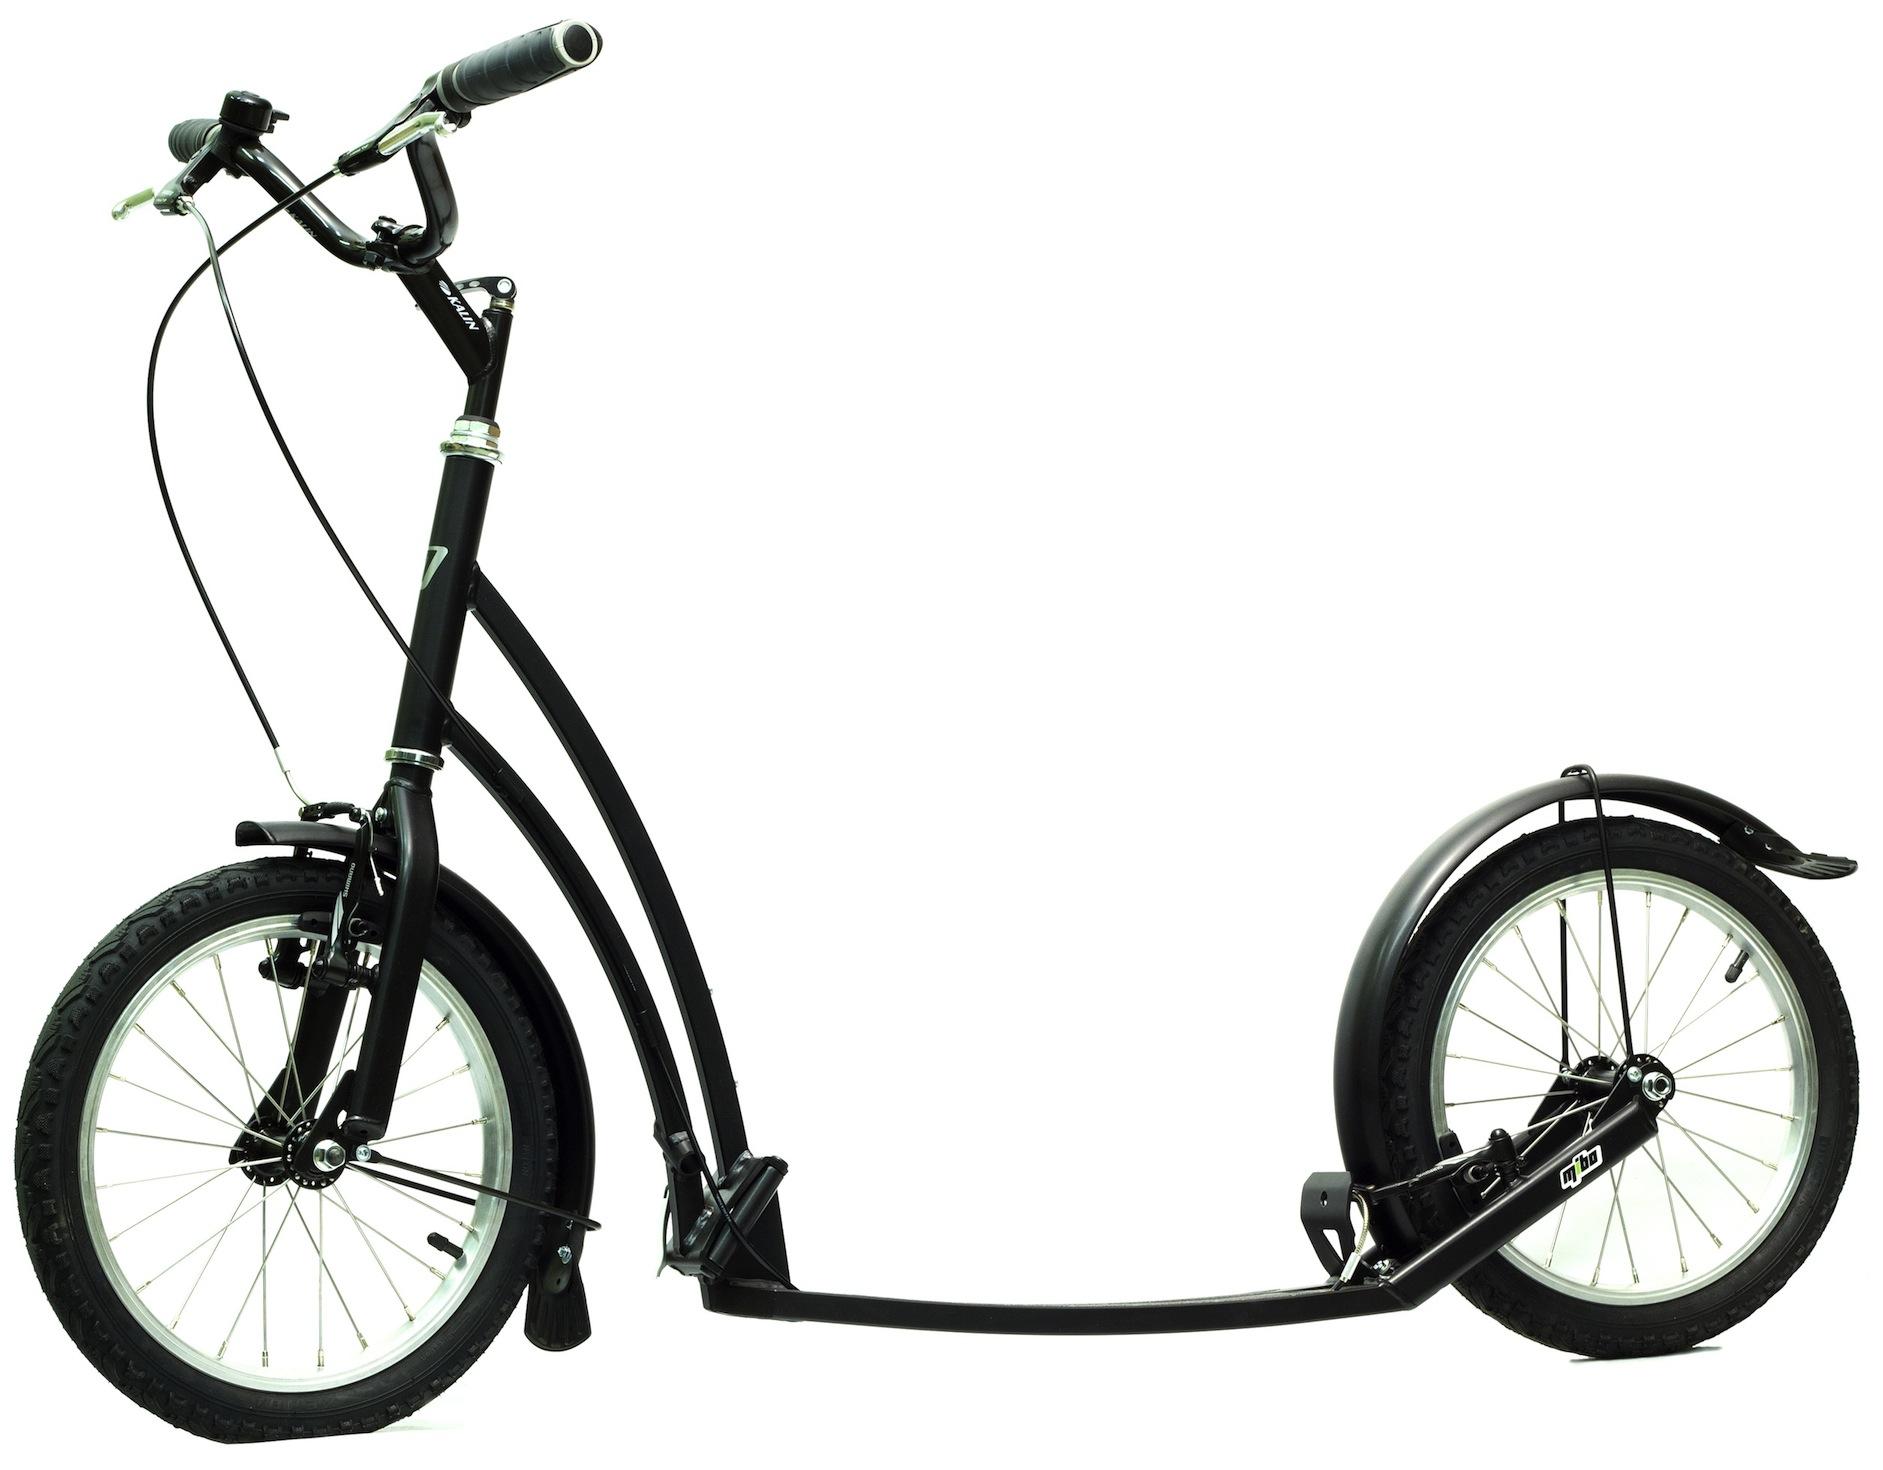 mibo master noire 16 16 adulte pliable grande roues. Black Bedroom Furniture Sets. Home Design Ideas